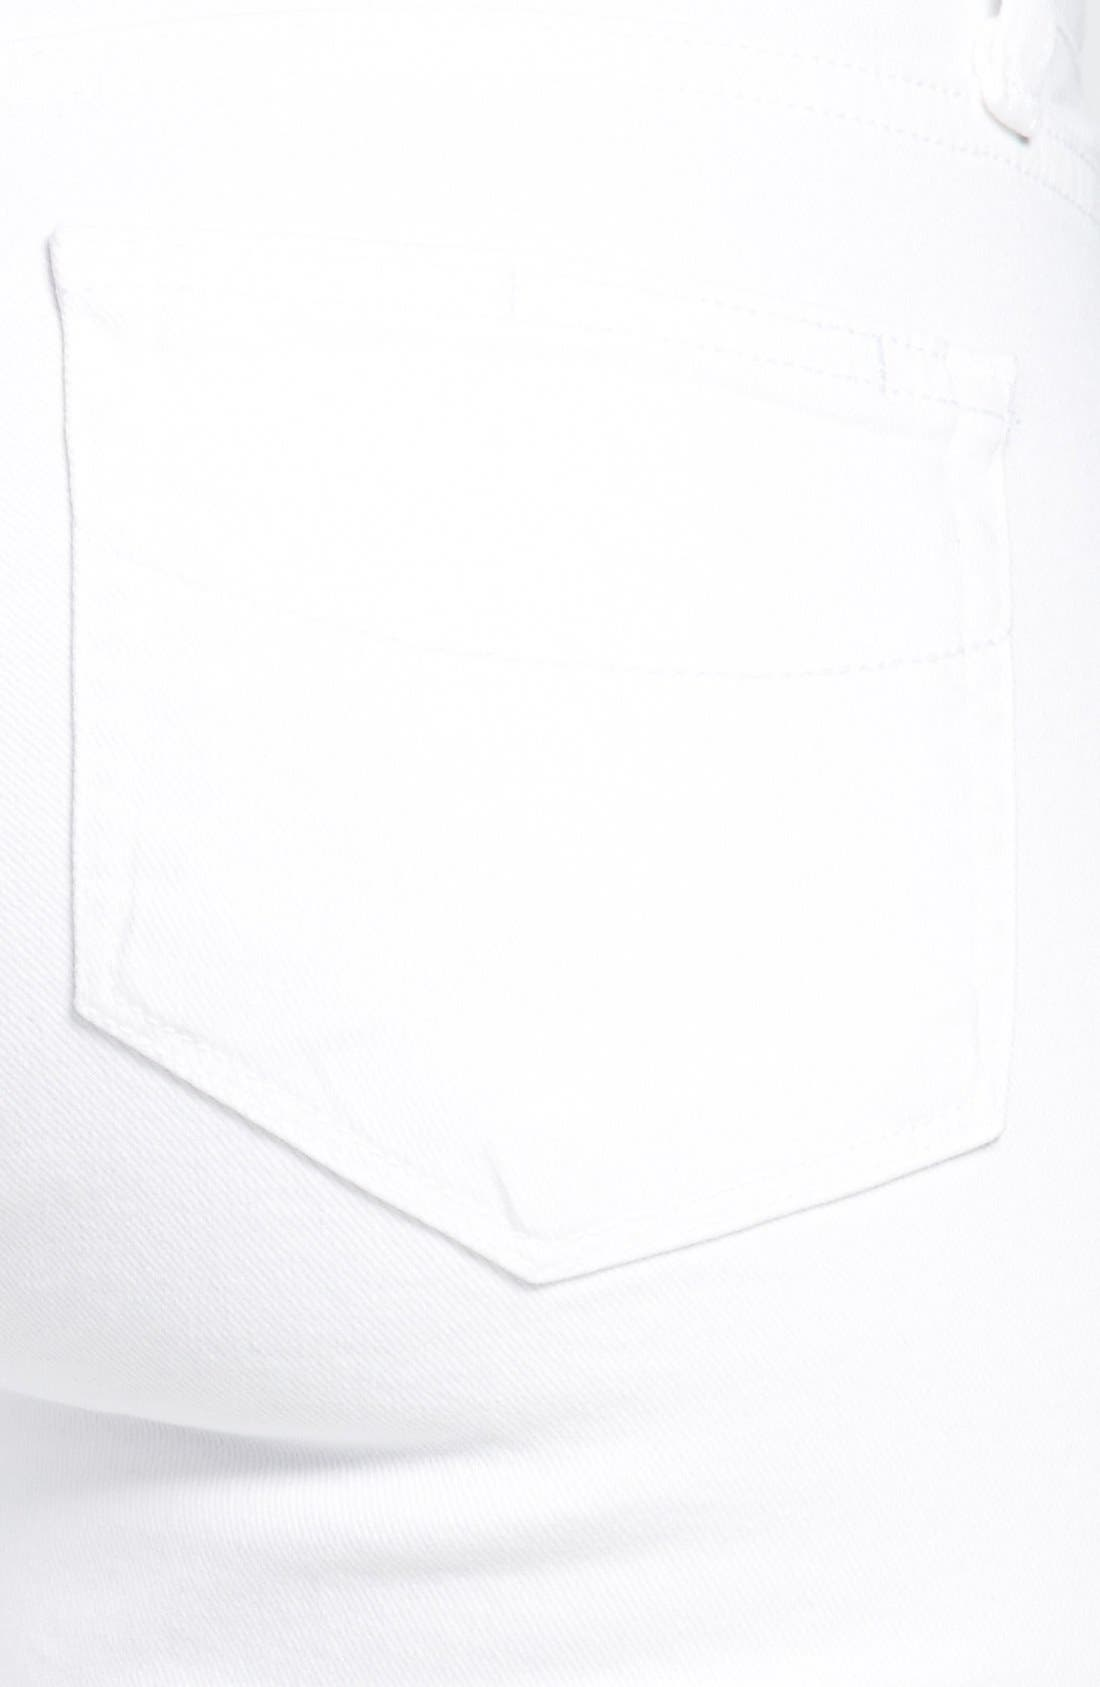 Alternate Image 3  - PAIGE 'Skyline' Skinny Jeans (Optic White)